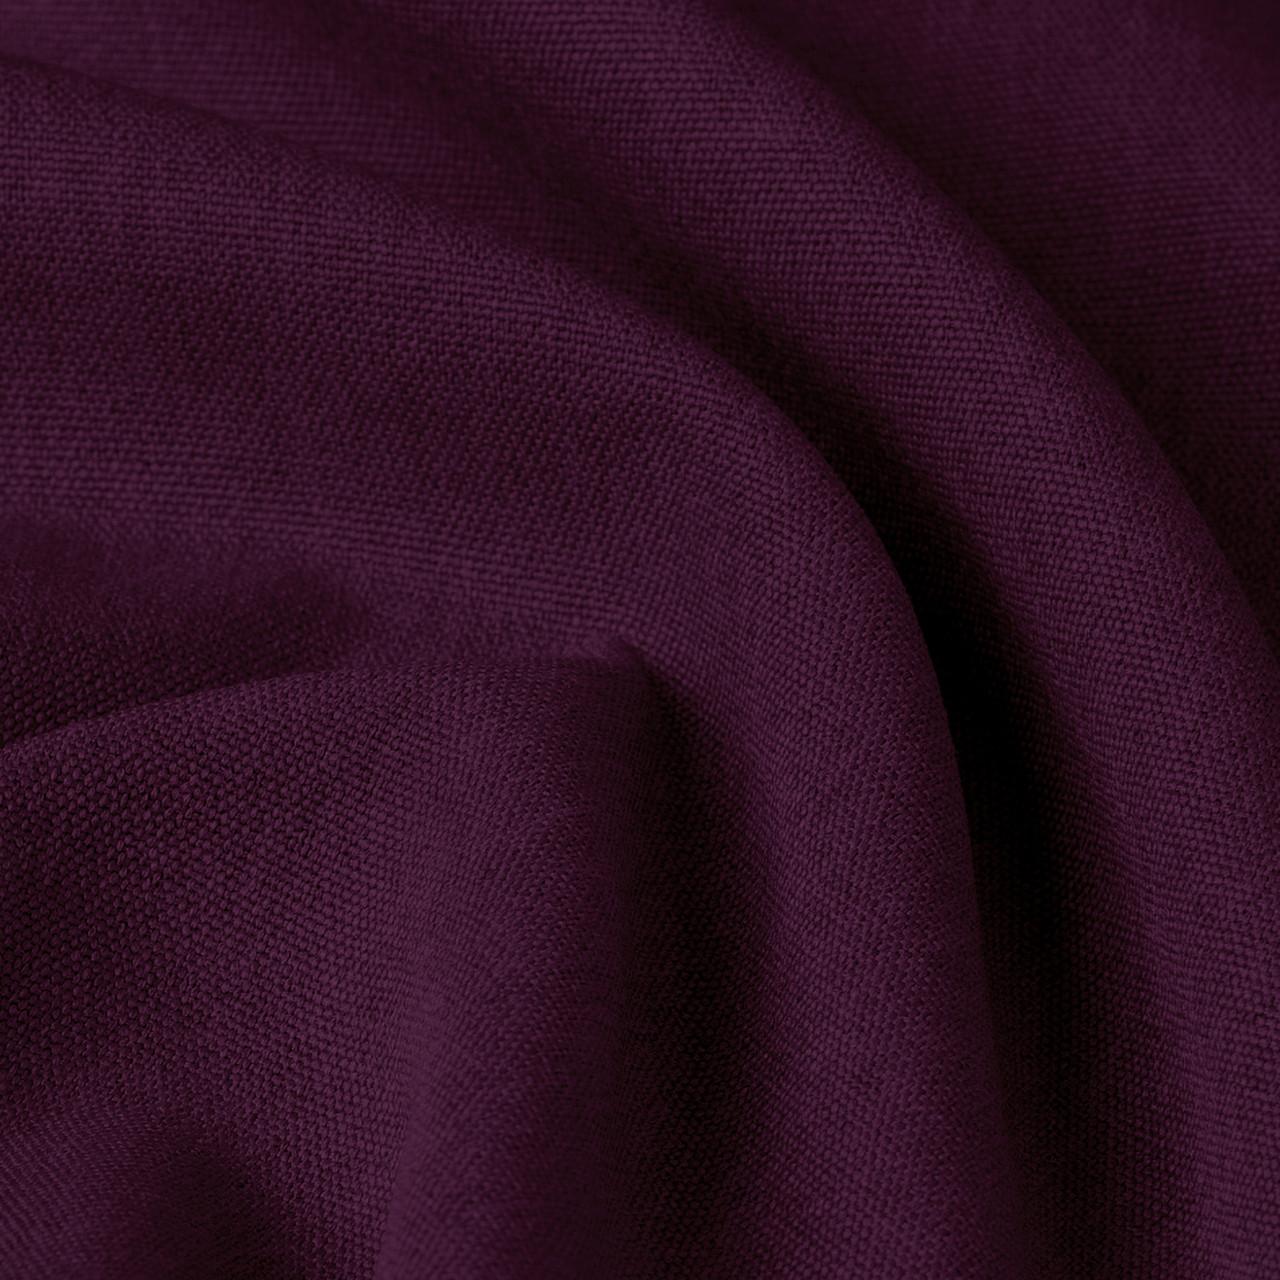 Блекаут фактурний бордового кольору Туреччина 85751v10